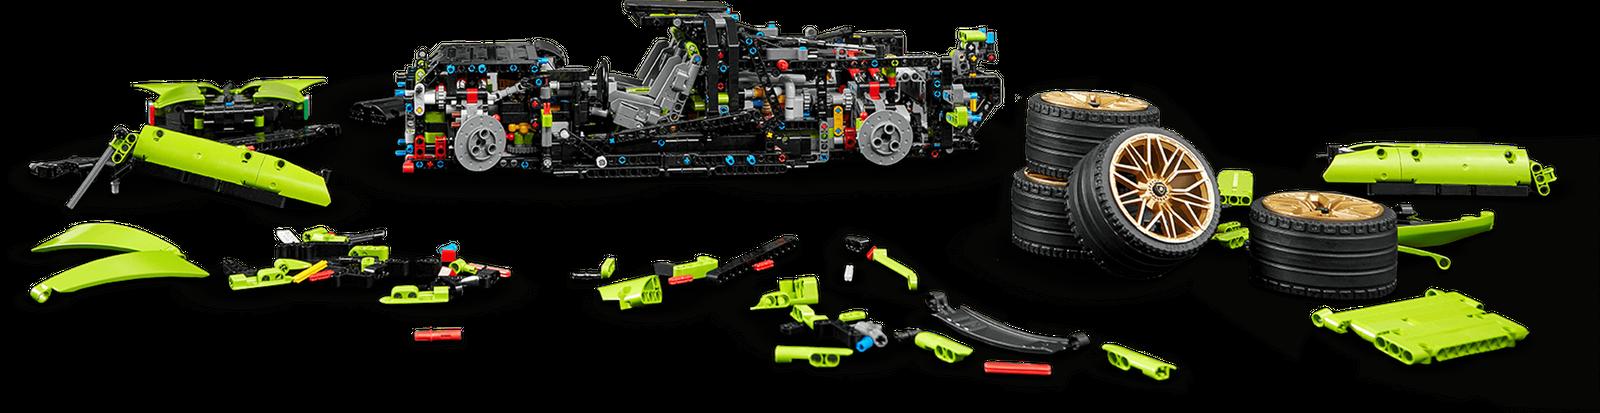 lego-technic-42115-lamborghini-sian-fkp-37-2020-1 zusammengebaut.com